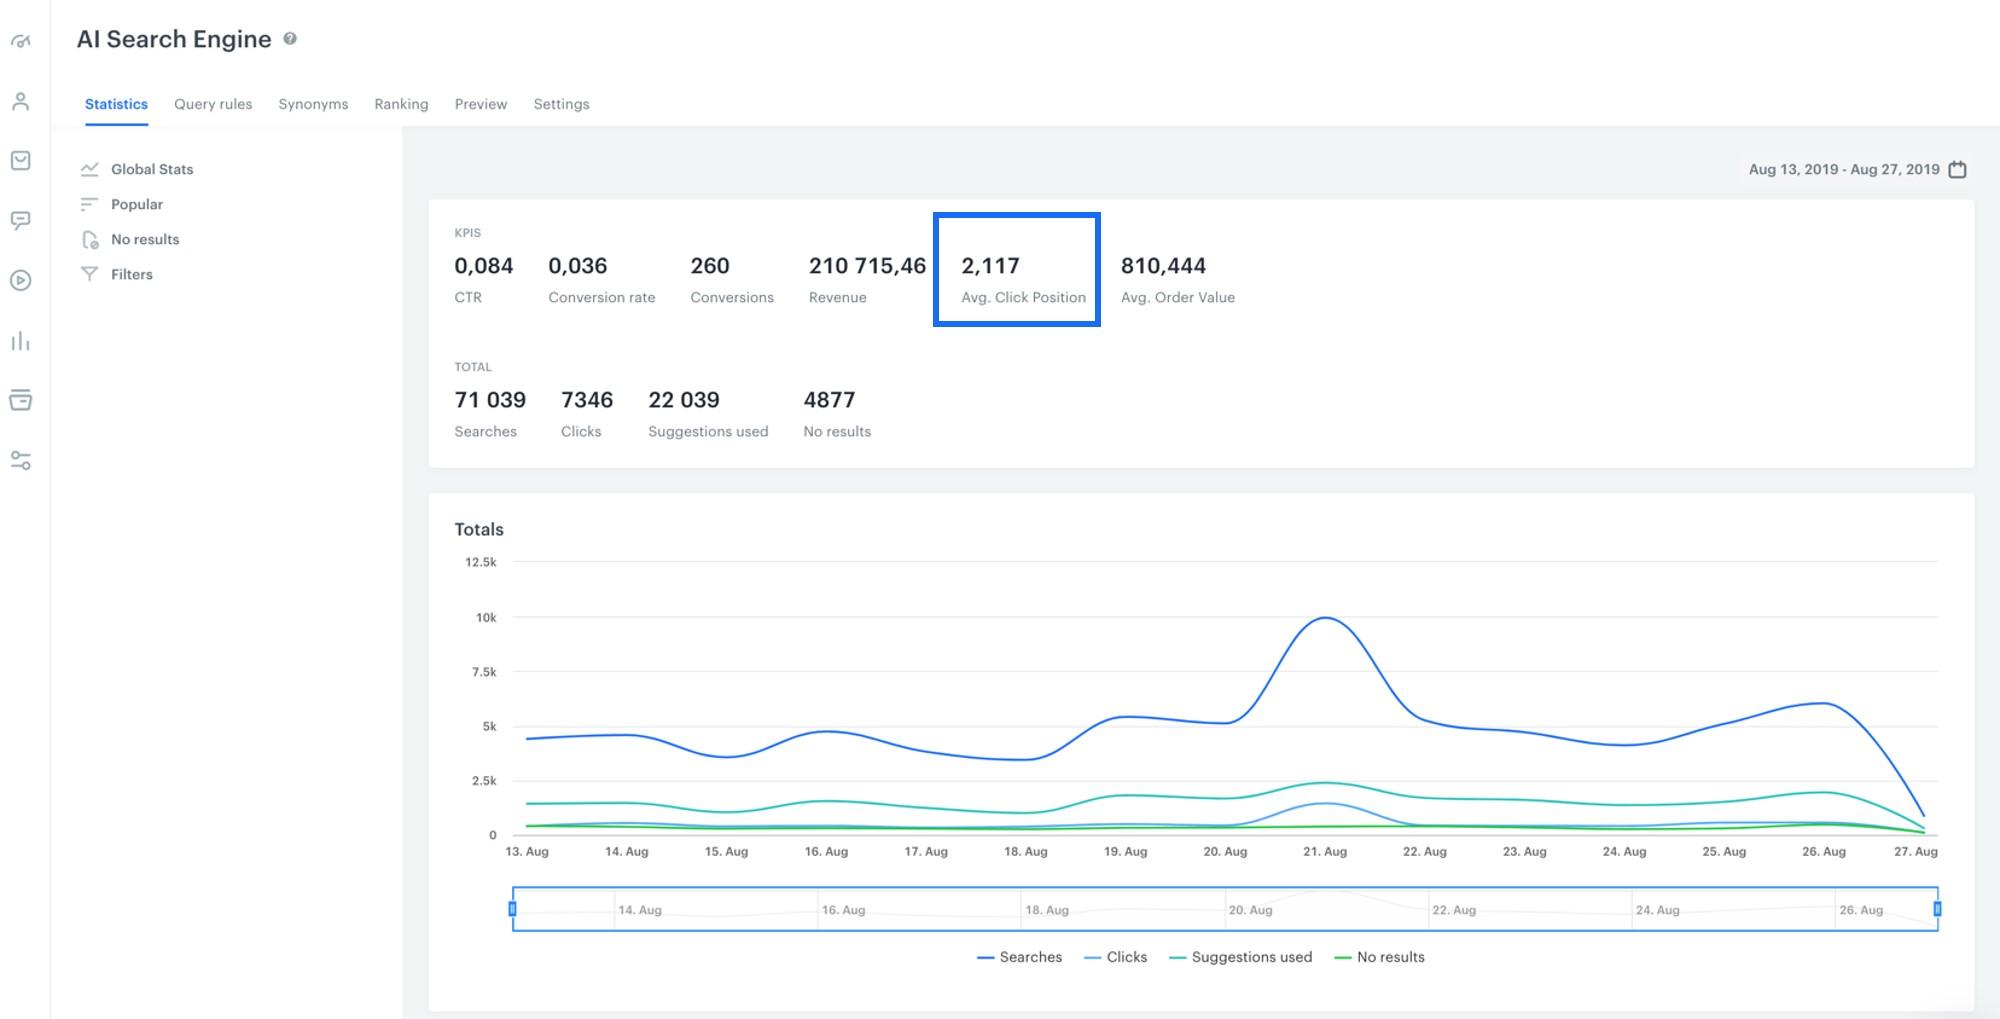 AI search engine - average click position